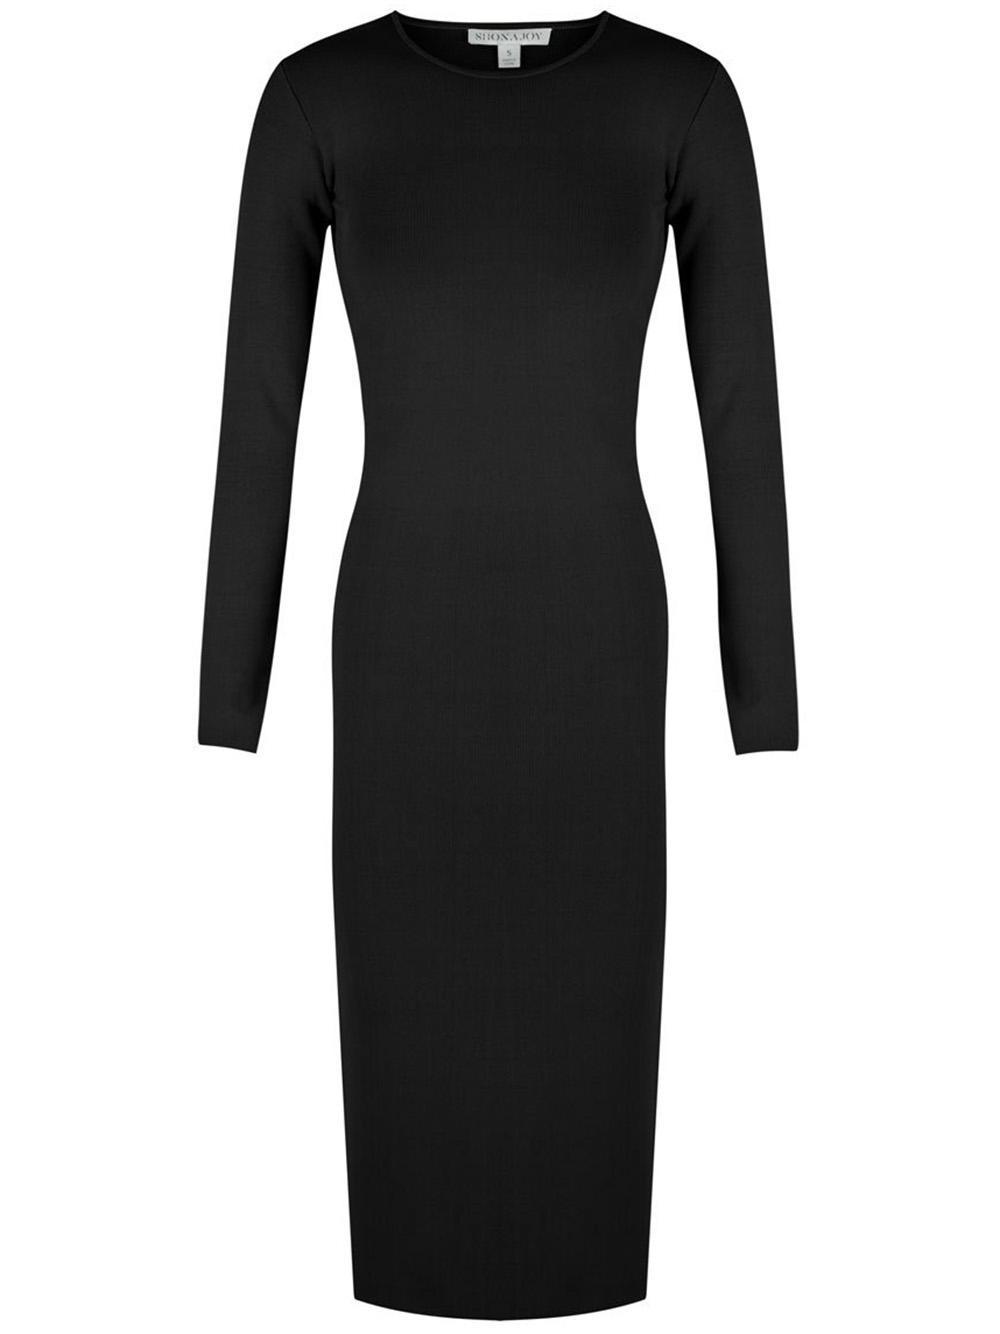 Lyon Backless Midi Dress Item # 213173